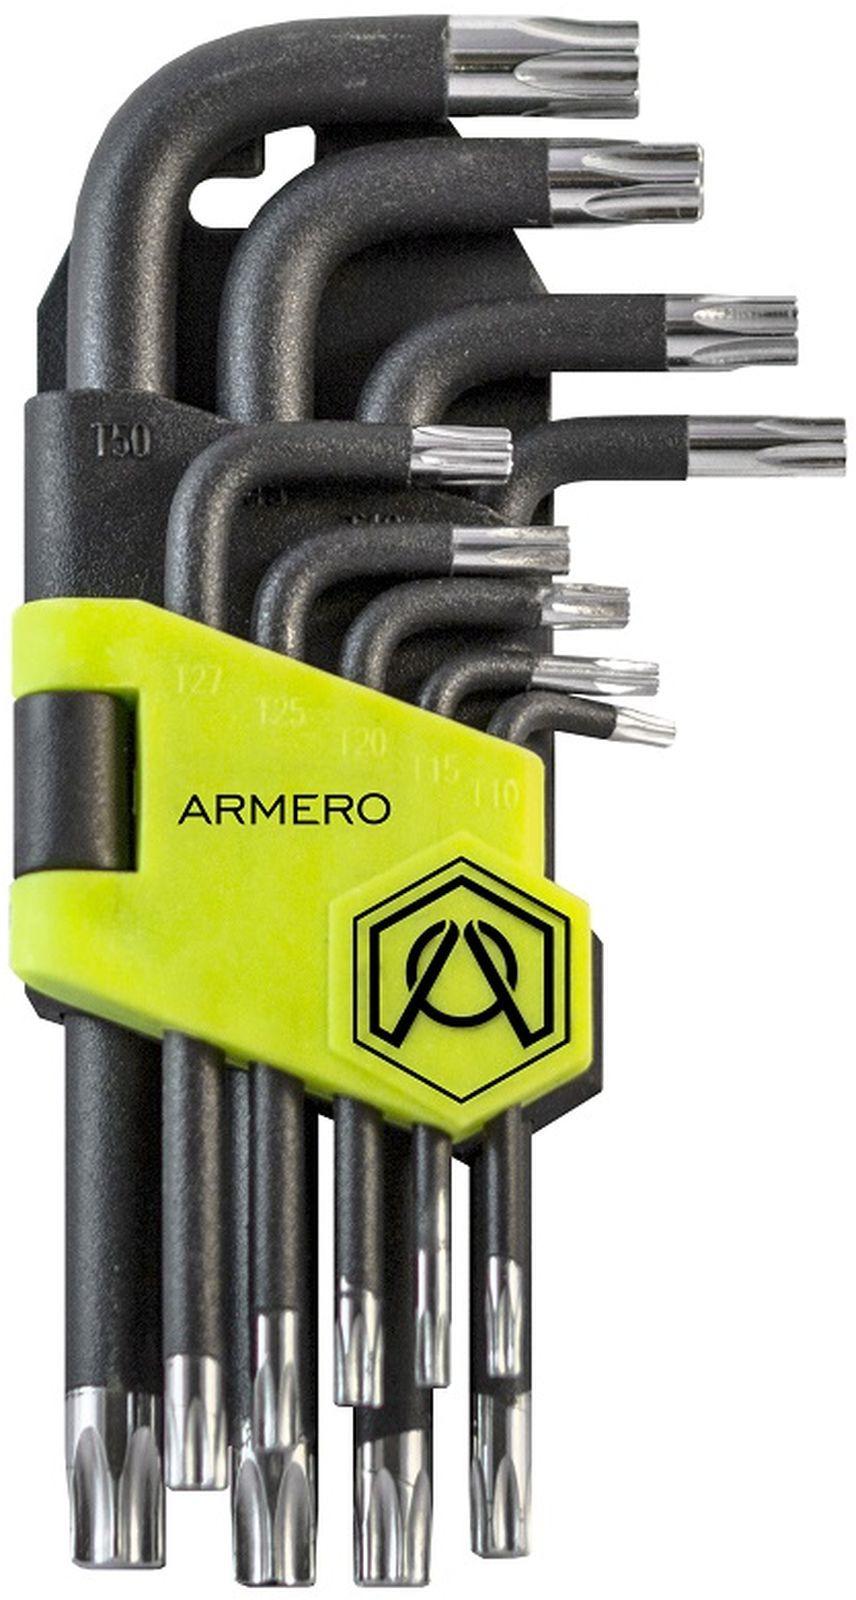 Набор ключей Armero Torx, CrV, короткие, 9 шт ключ torx t27 угловой aist 154227tt